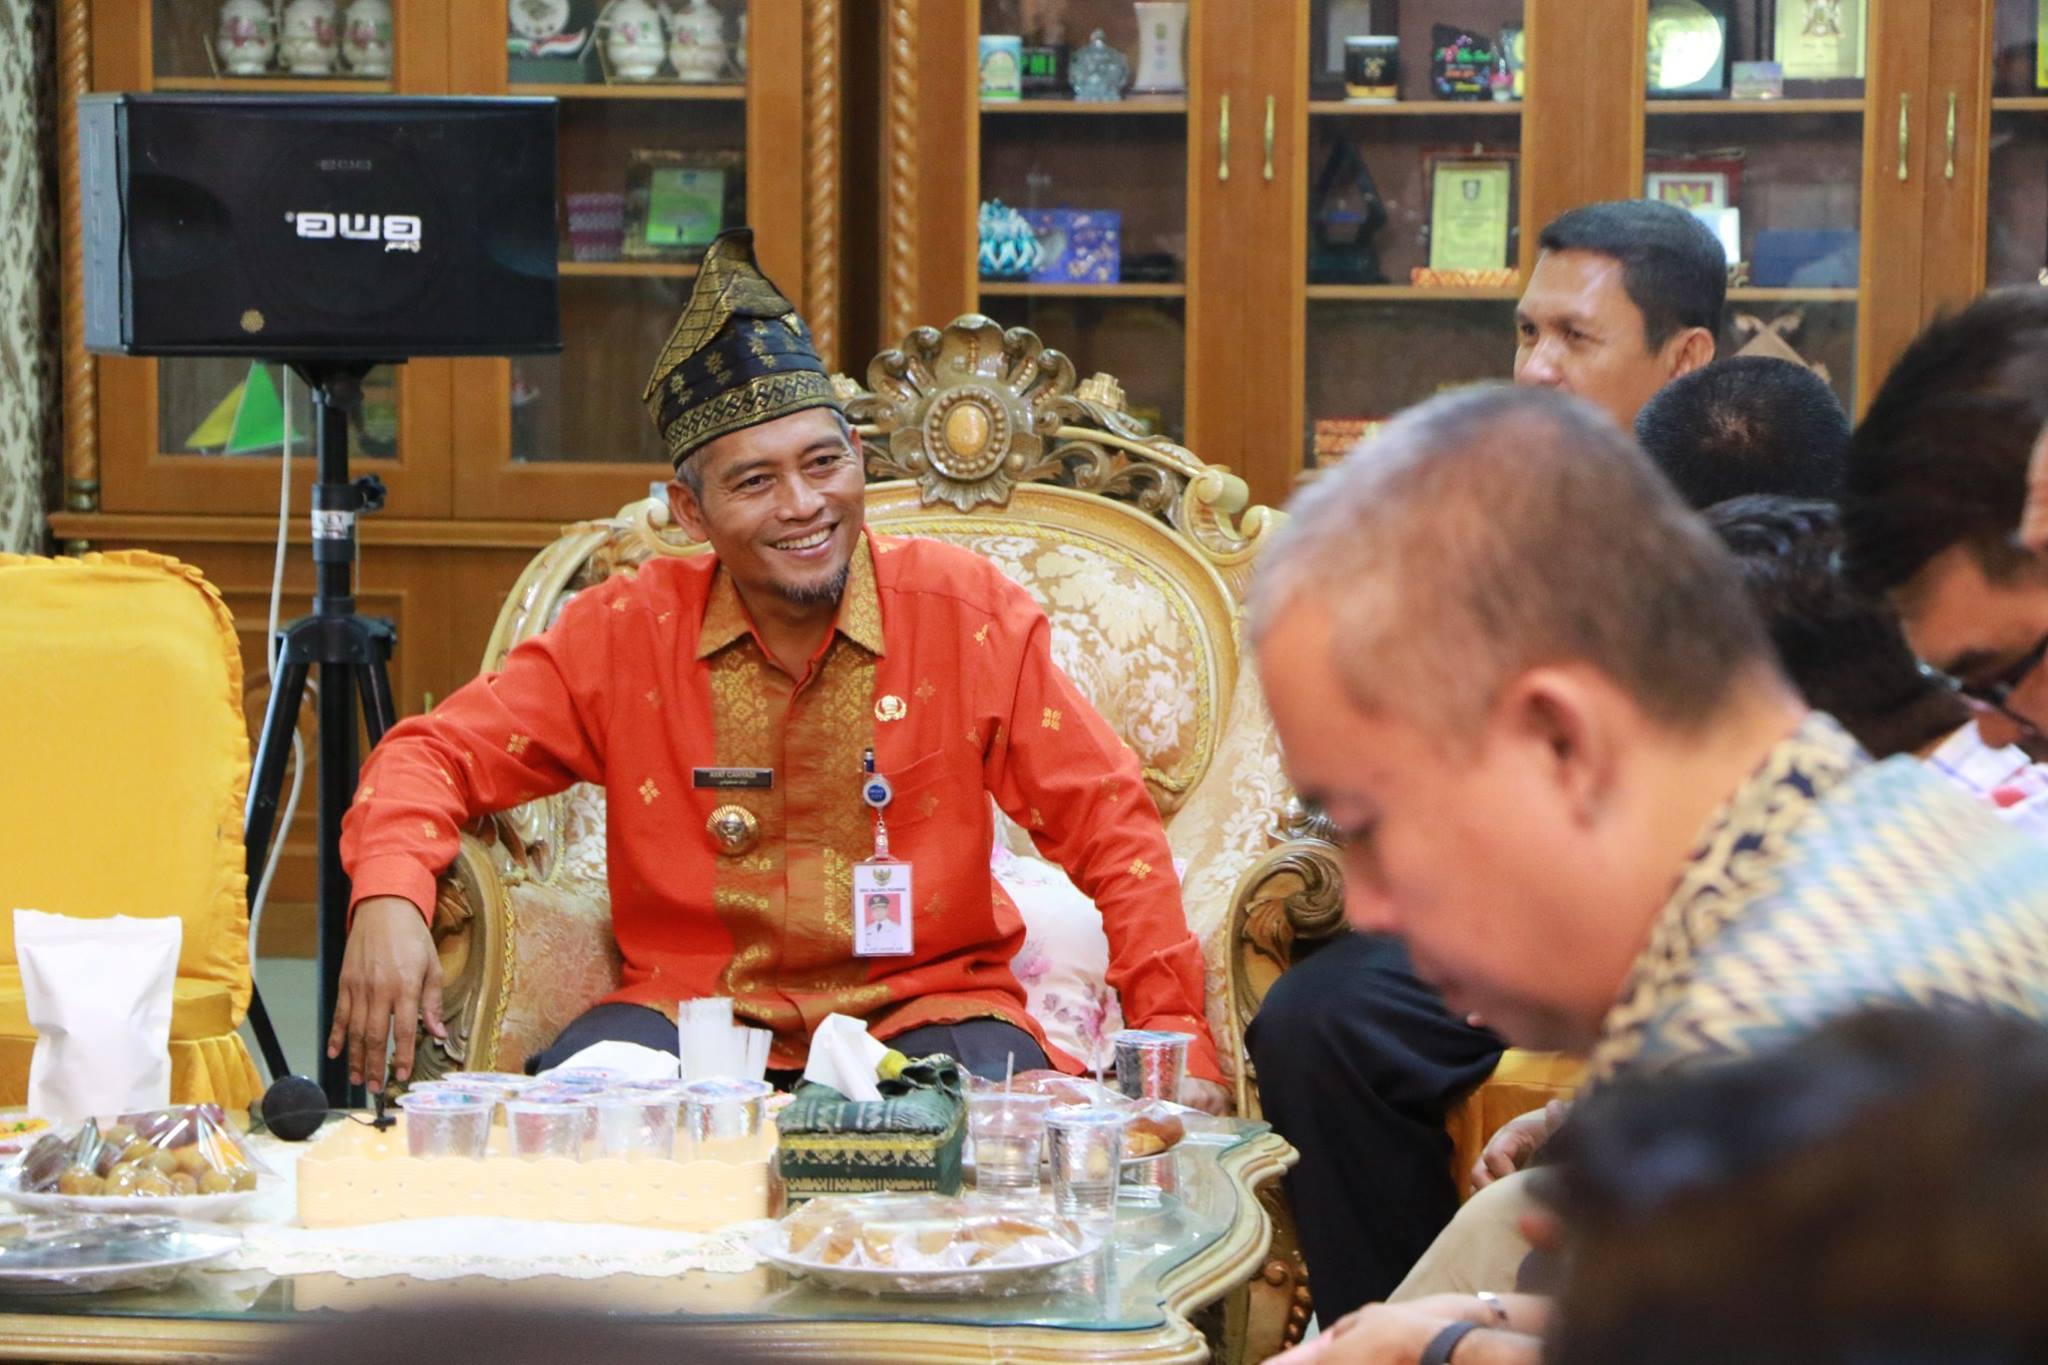 Wakil Wali kota Pekanbaru H. Ayat Cahyadi, S,Si Bersama Istri Buk Hj. Indria Rita S,Pd bersilaturahm